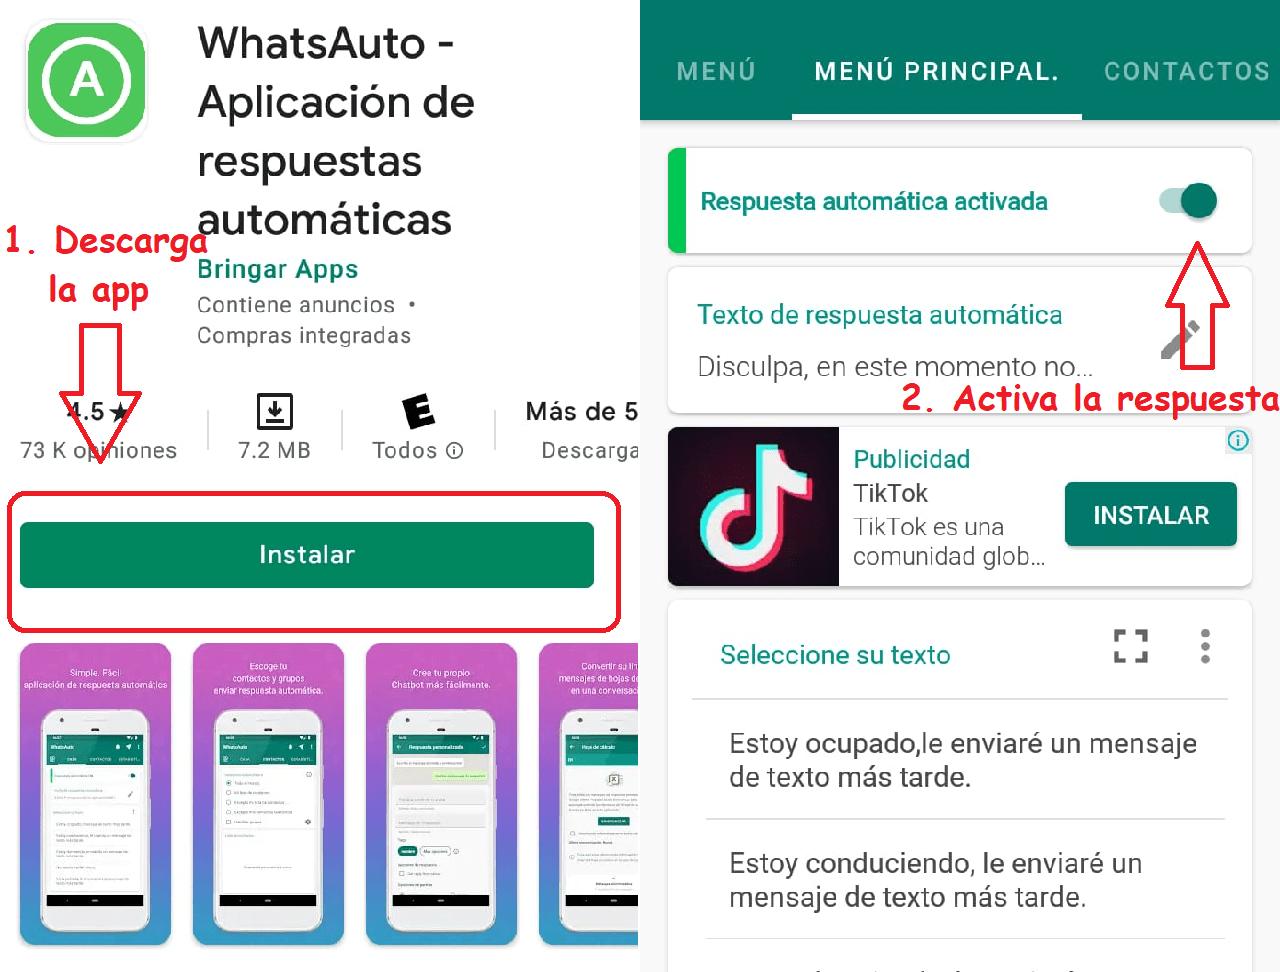 whats auto descargar respuestas automáticas whatsapp